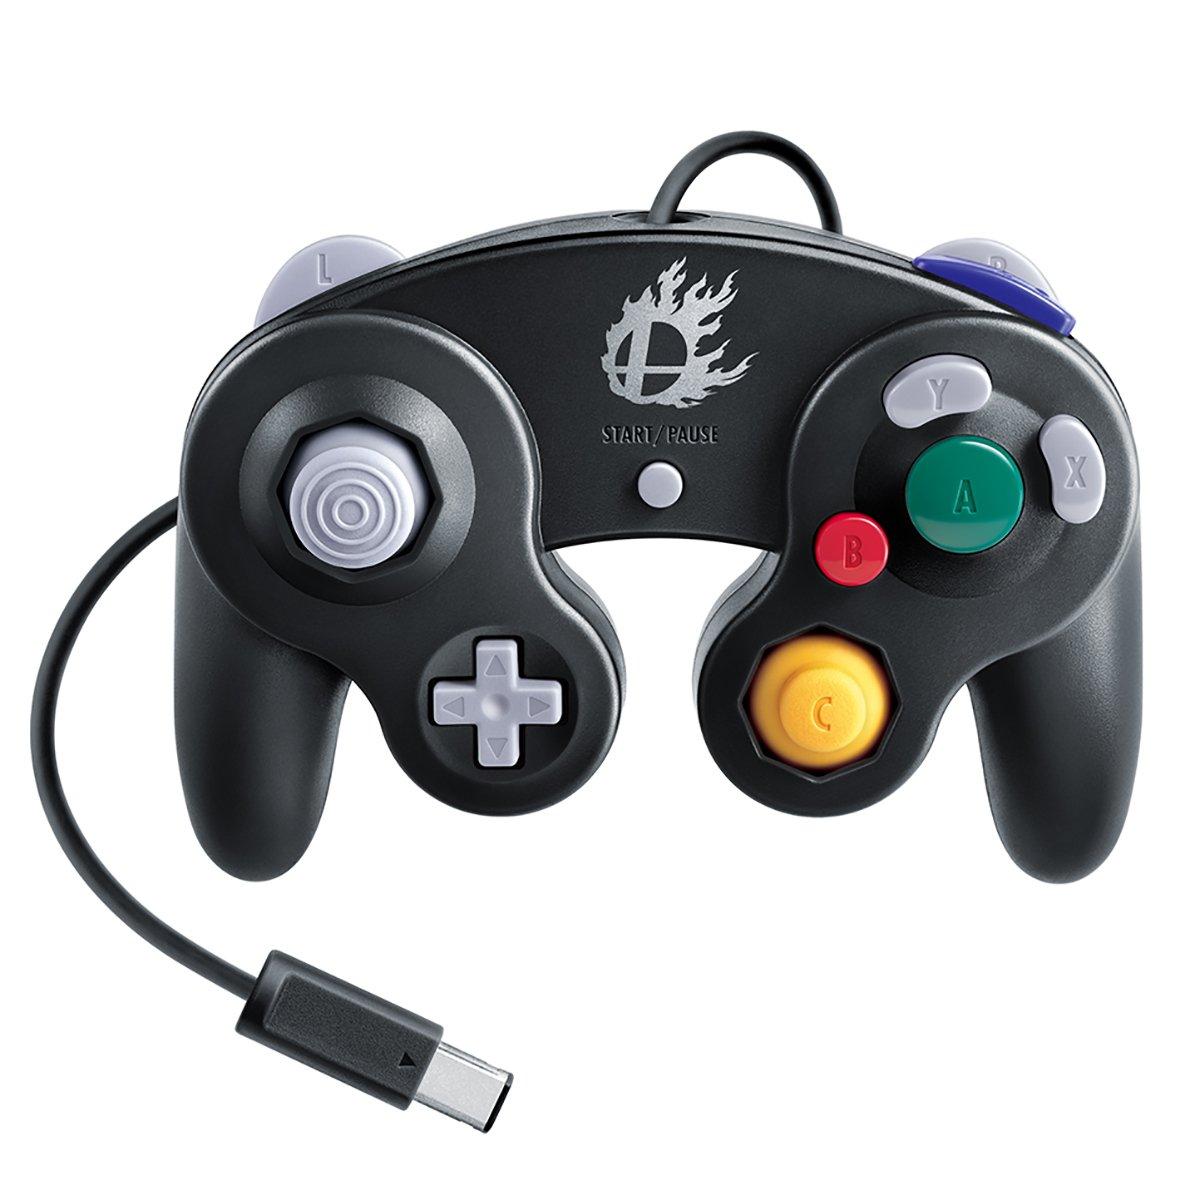 Edition GameCube Controller: Amazon.co.uk: PC & Video Games